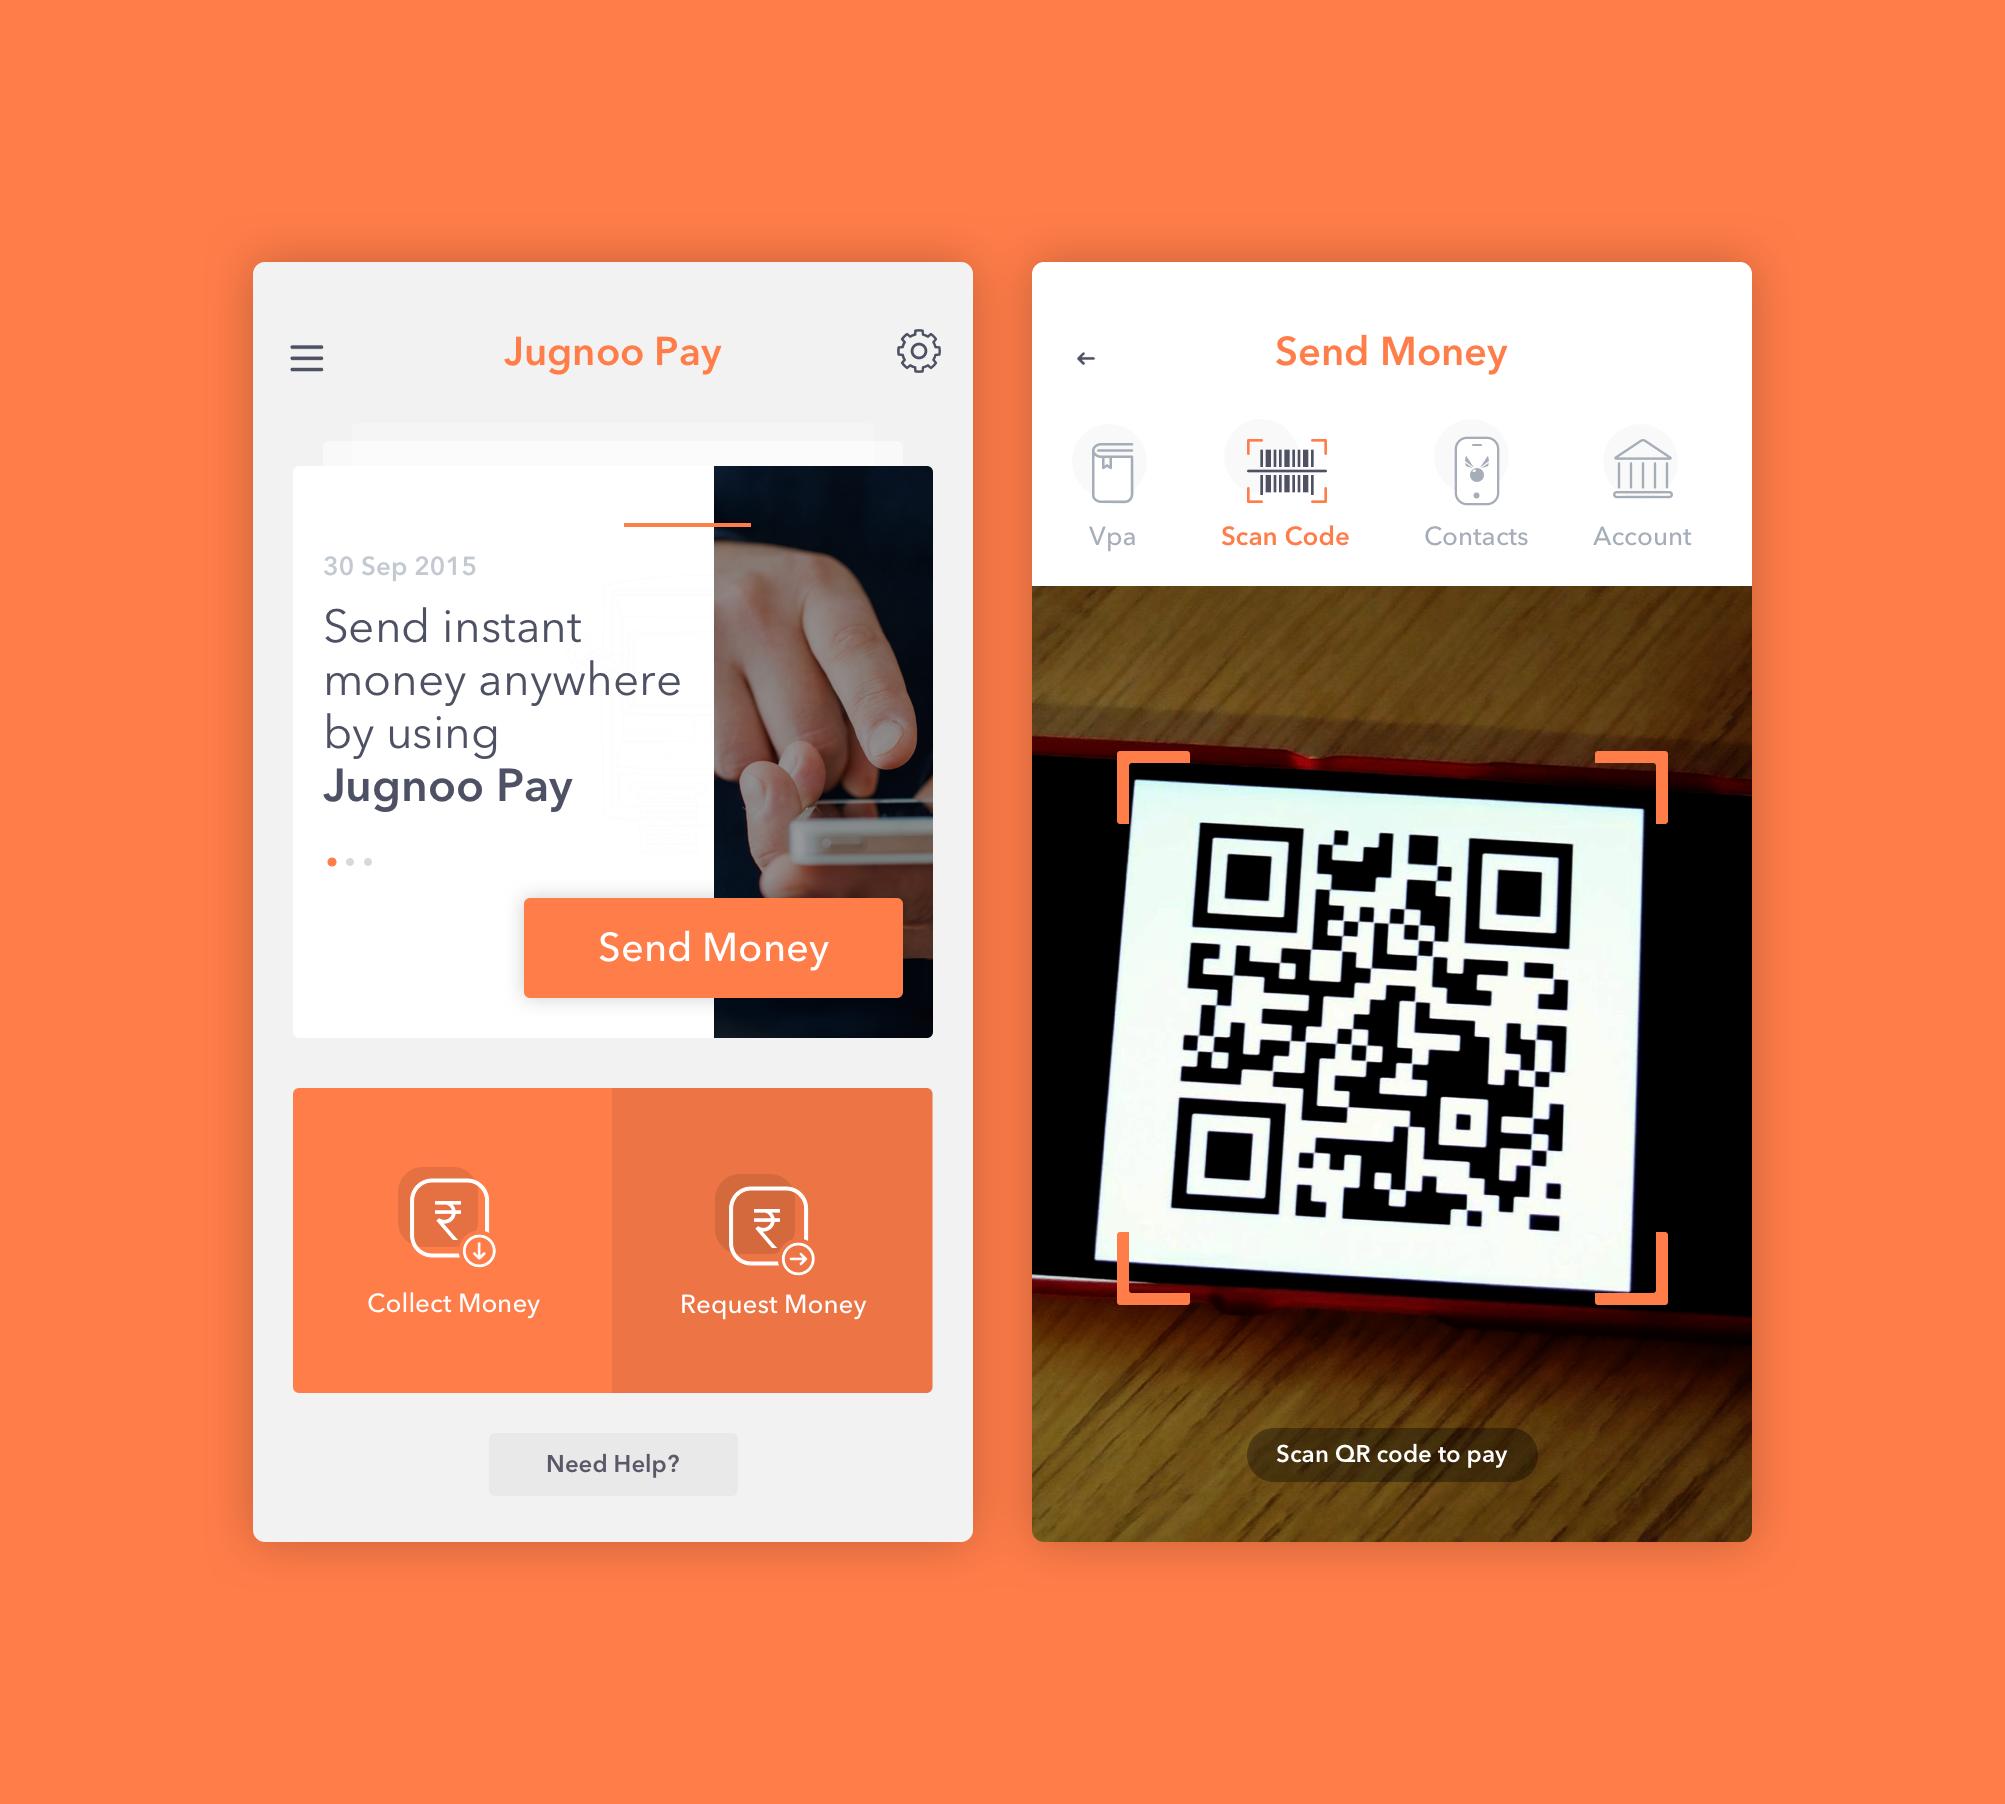 Jugnoo Pay App Design. App design, App, Instant money